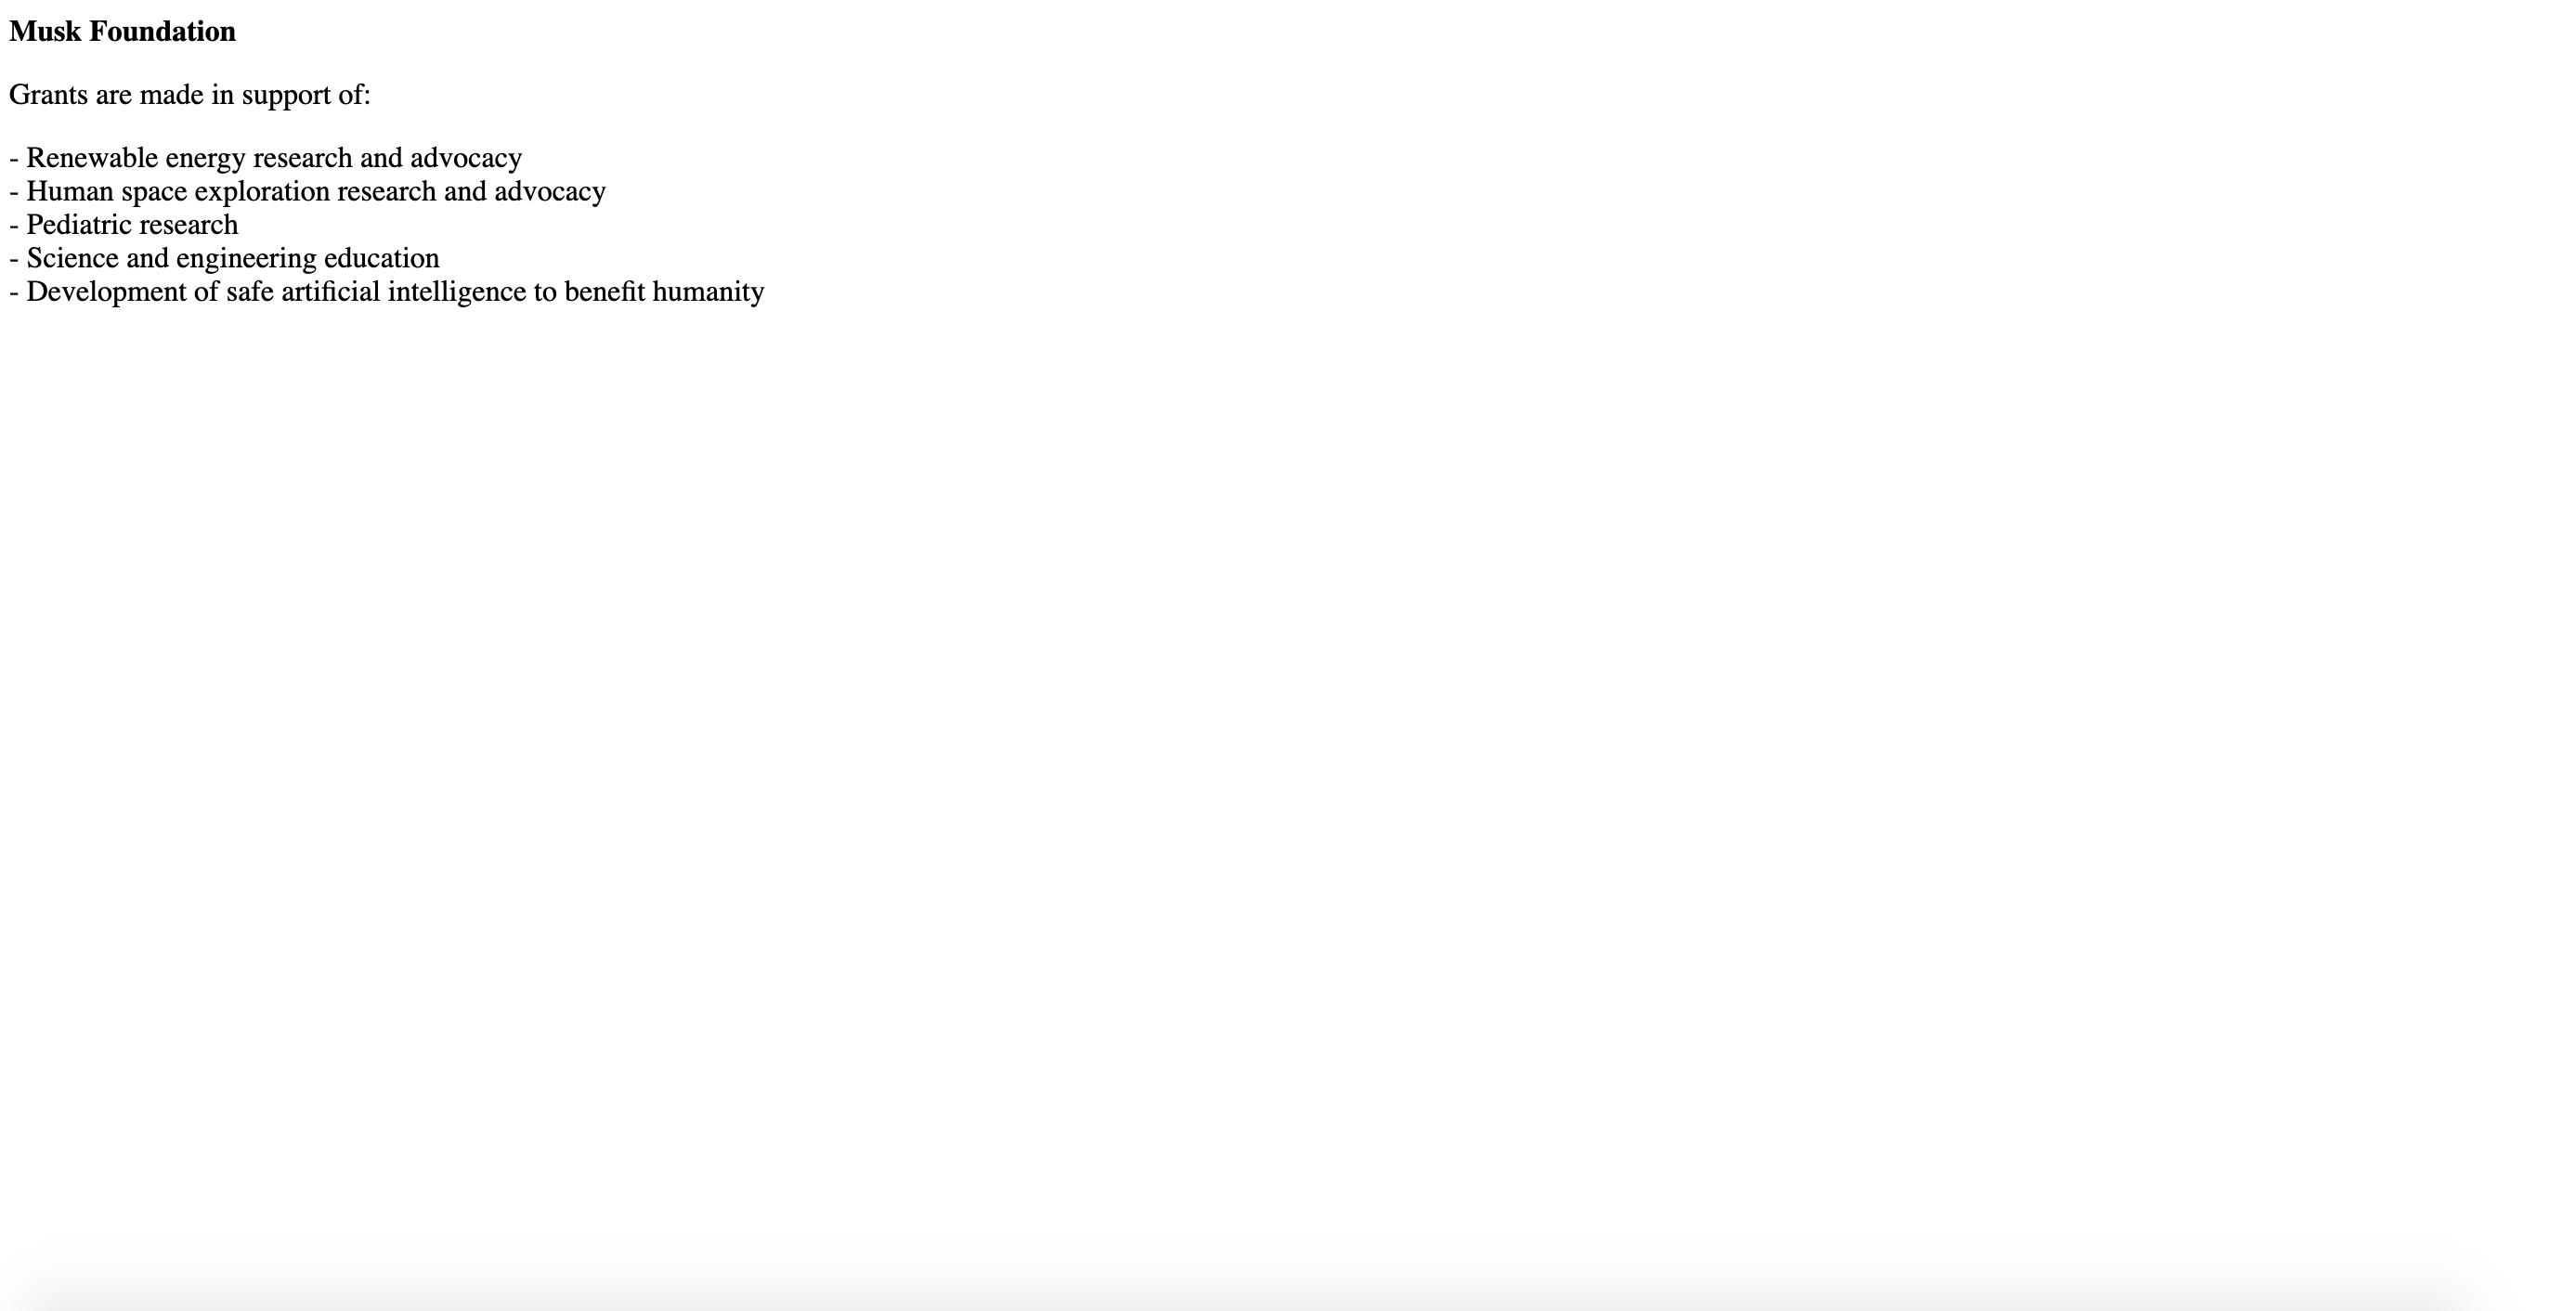 screenshot of the Musk foundation website